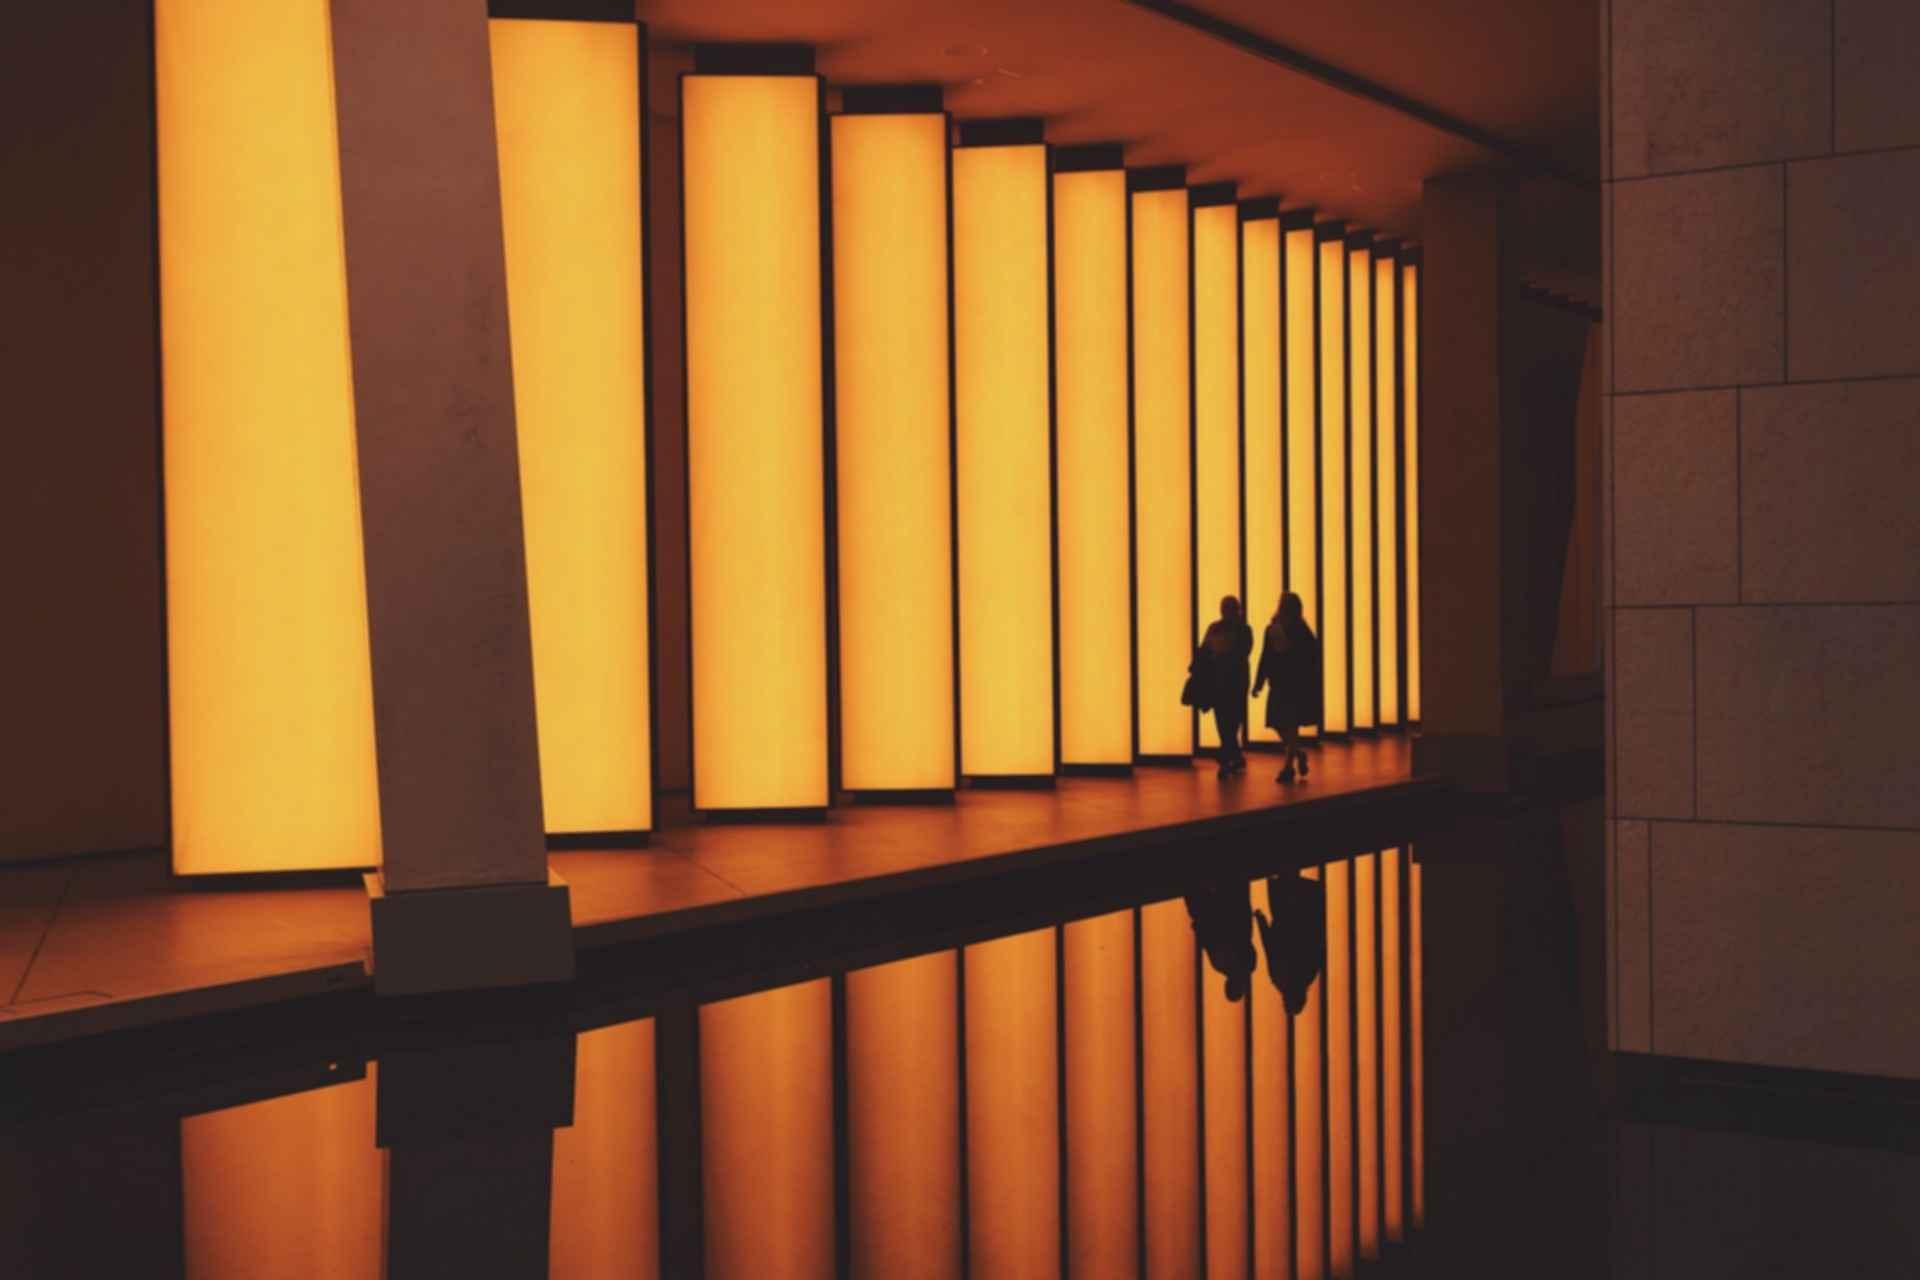 Water reflecting buildings